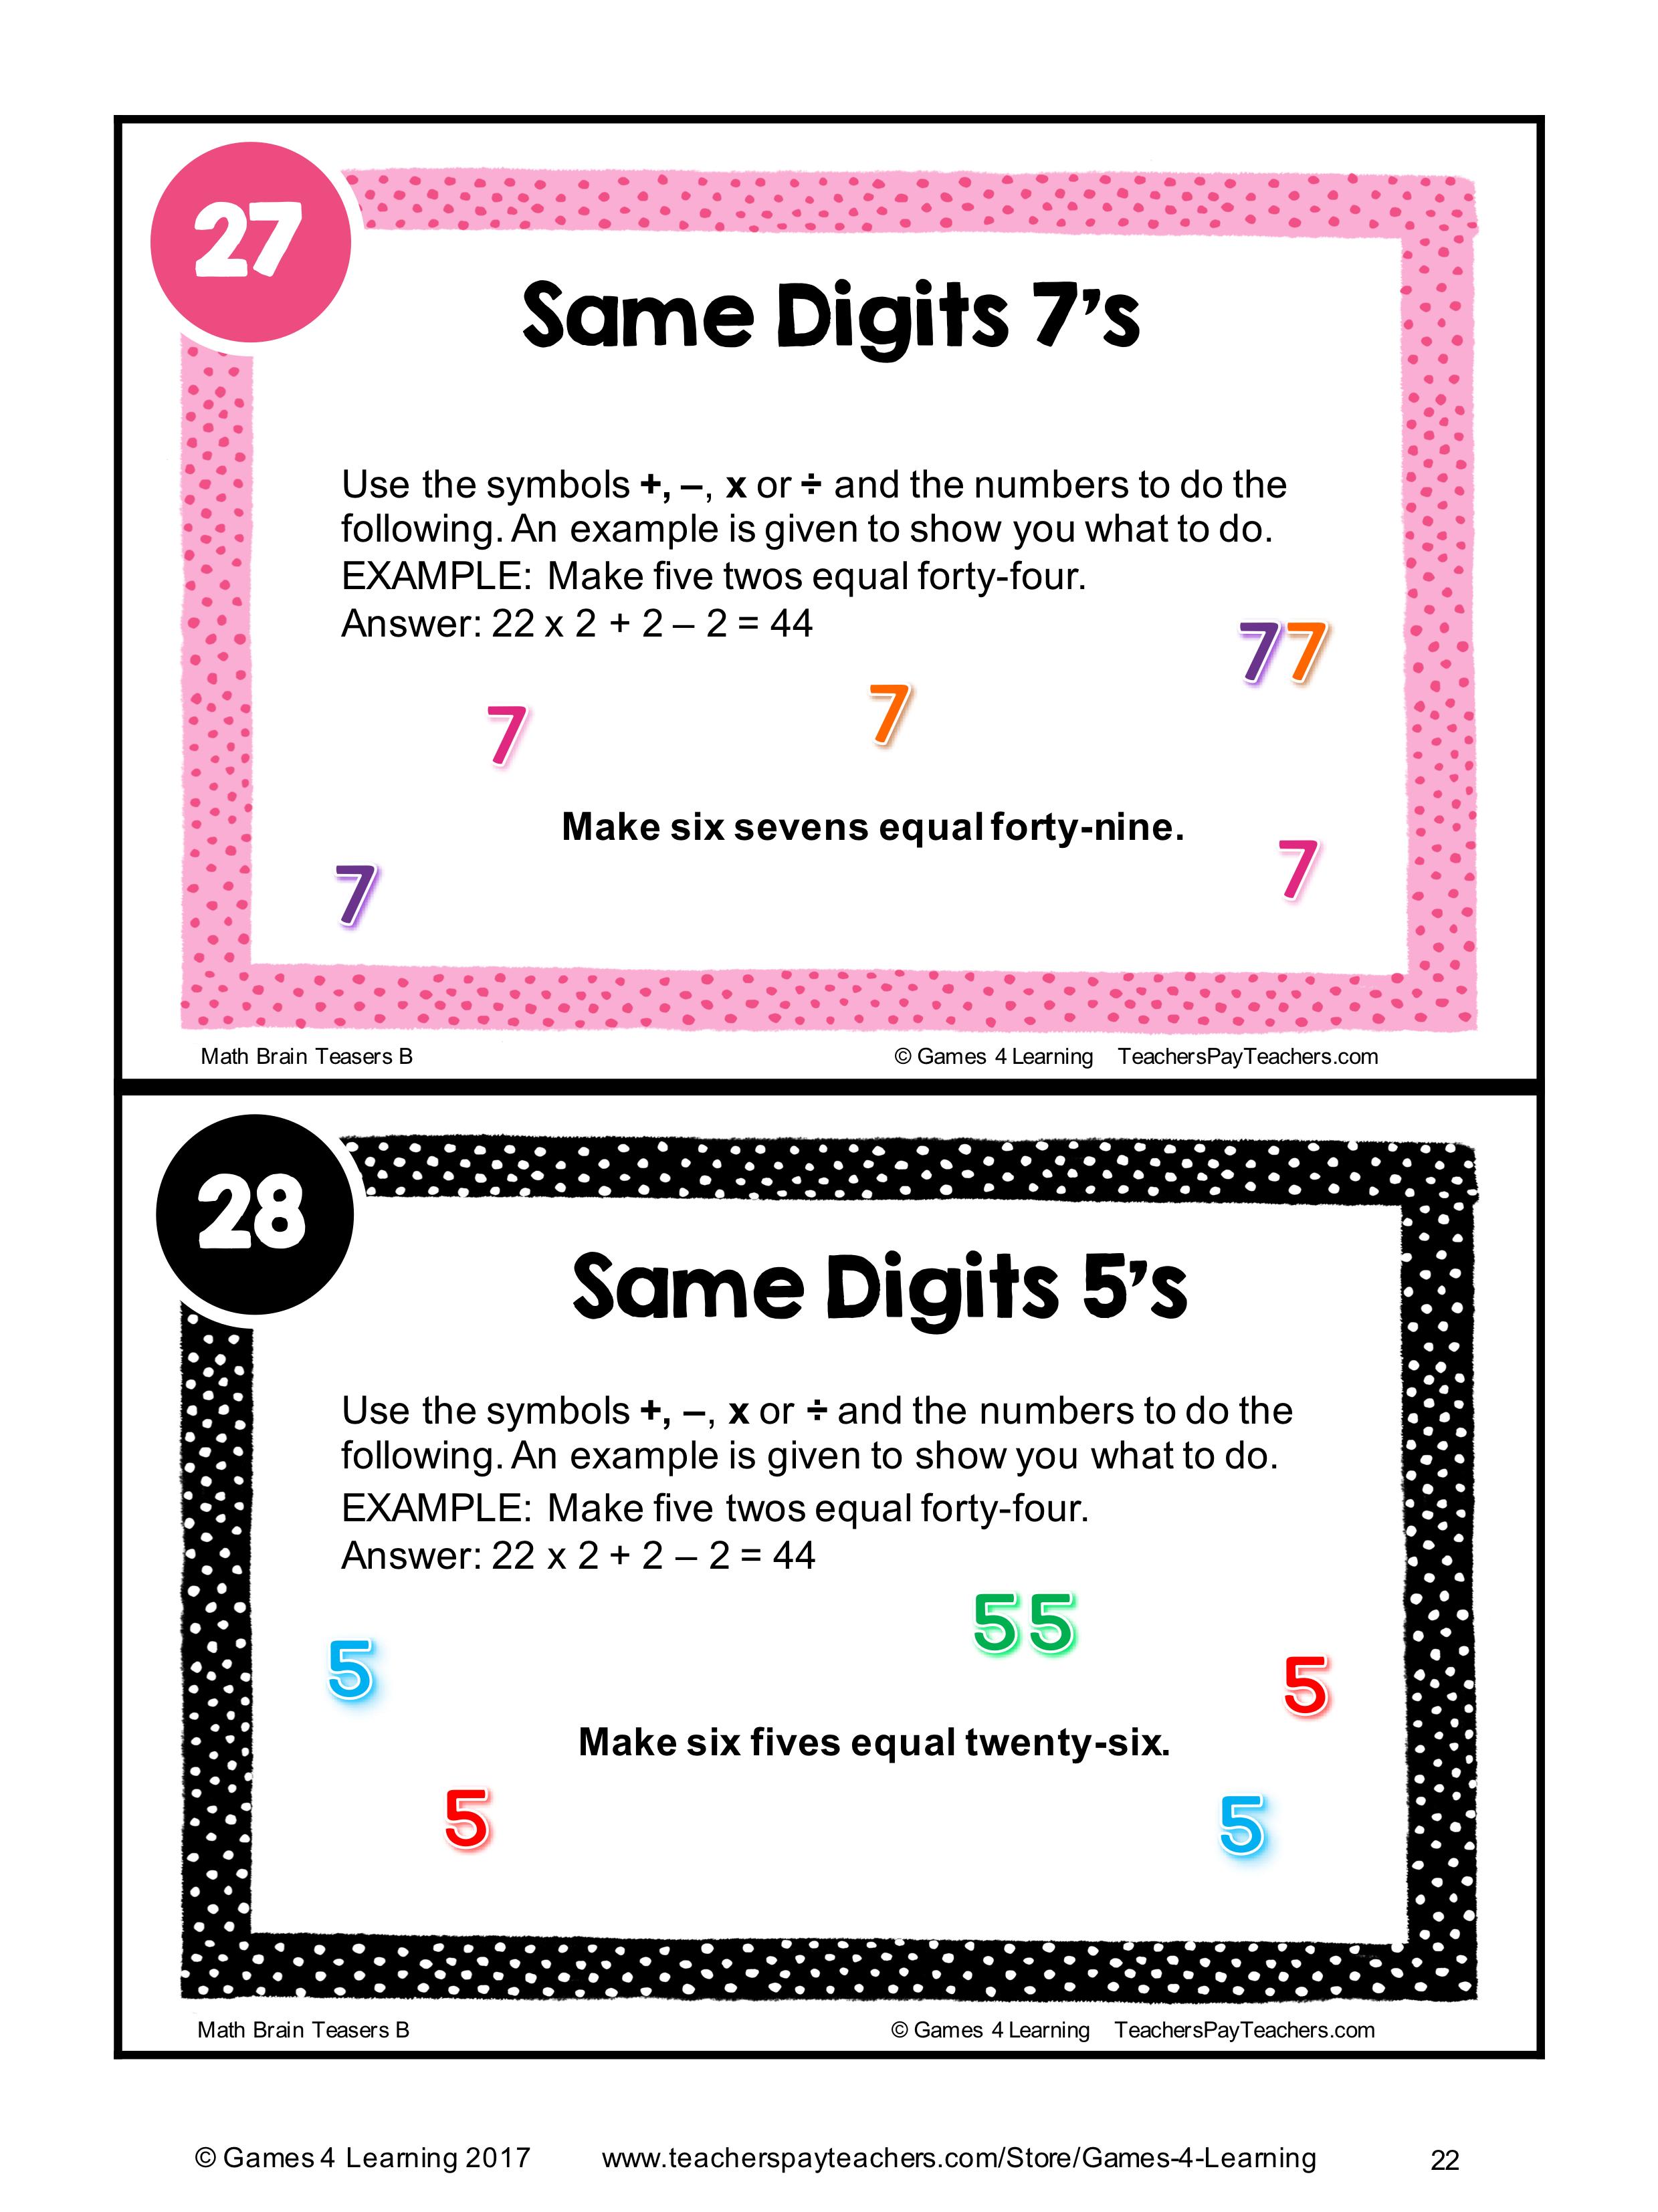 Math Task Cards Math Problems And Math Brain Teasers Cards Set B